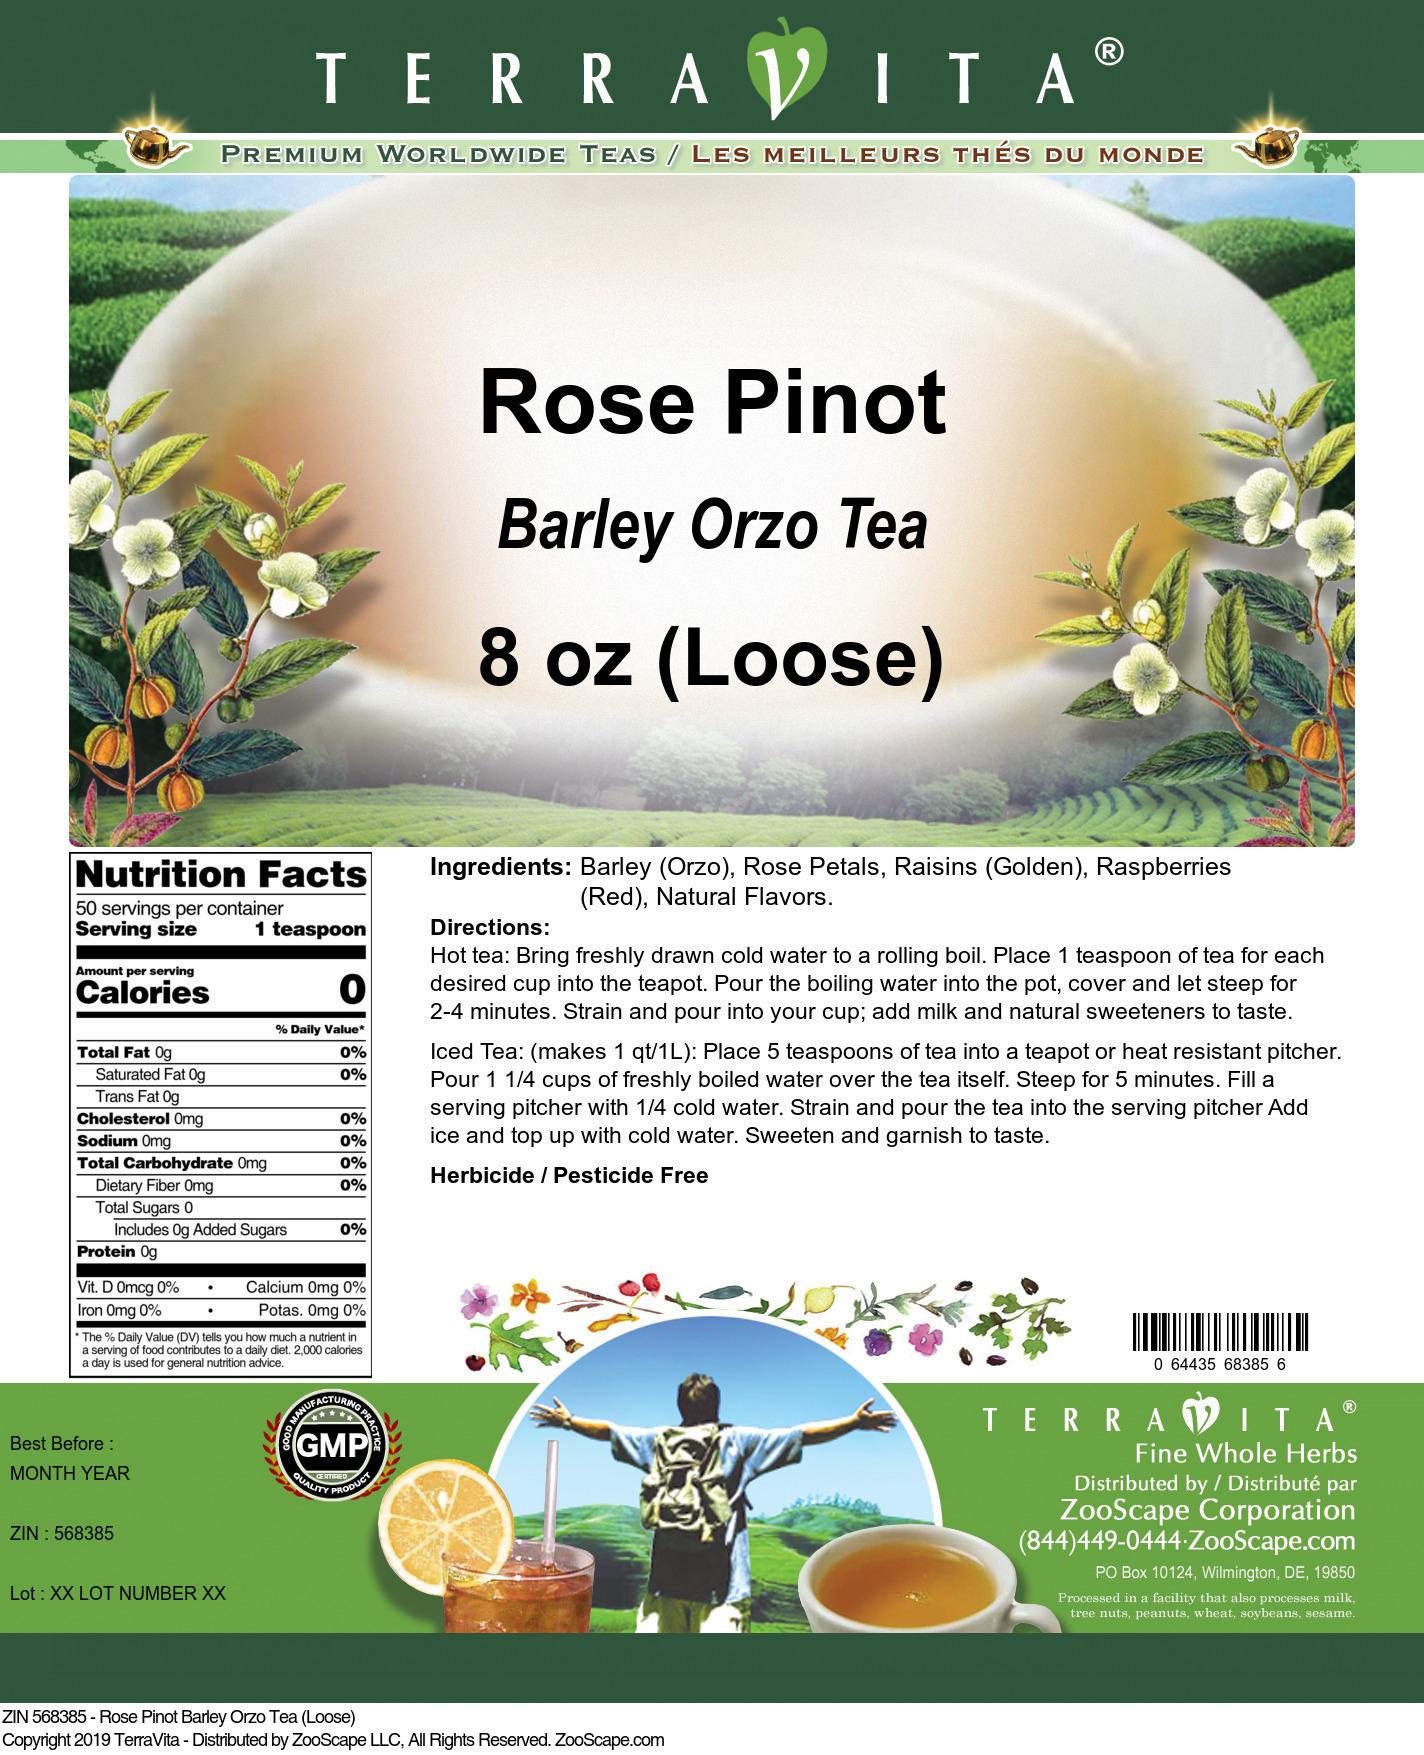 Rose Pinot Barley Orzo Tea (Loose)